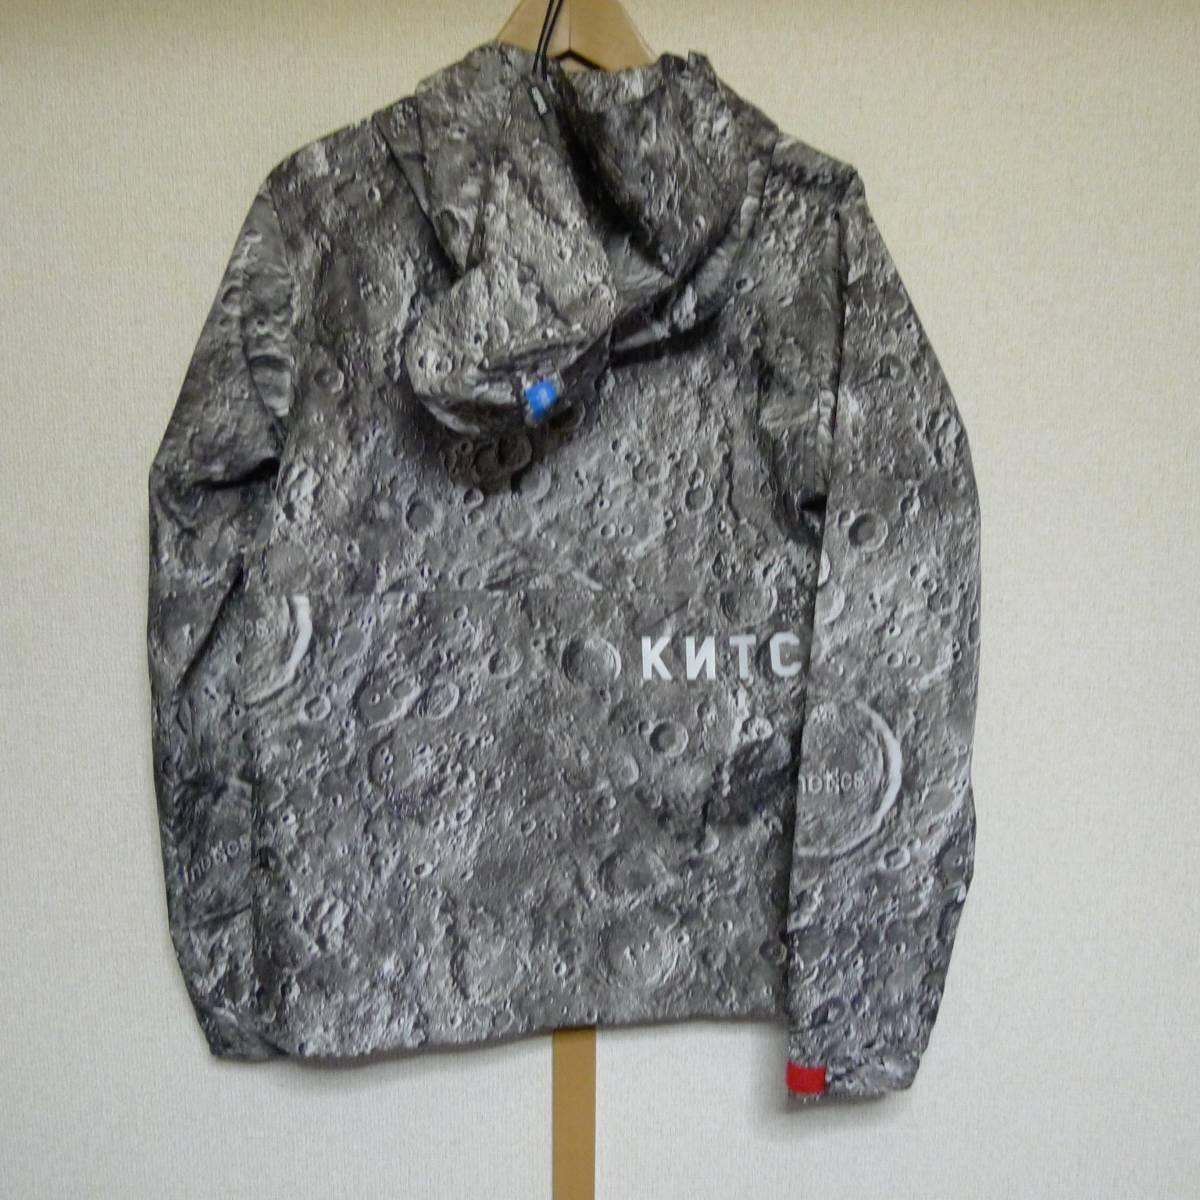 Kinetics × Columbia Tyger SweepTM Jacket タイガースウィープジャケット 月面柄 キネティックス コラボ_画像4